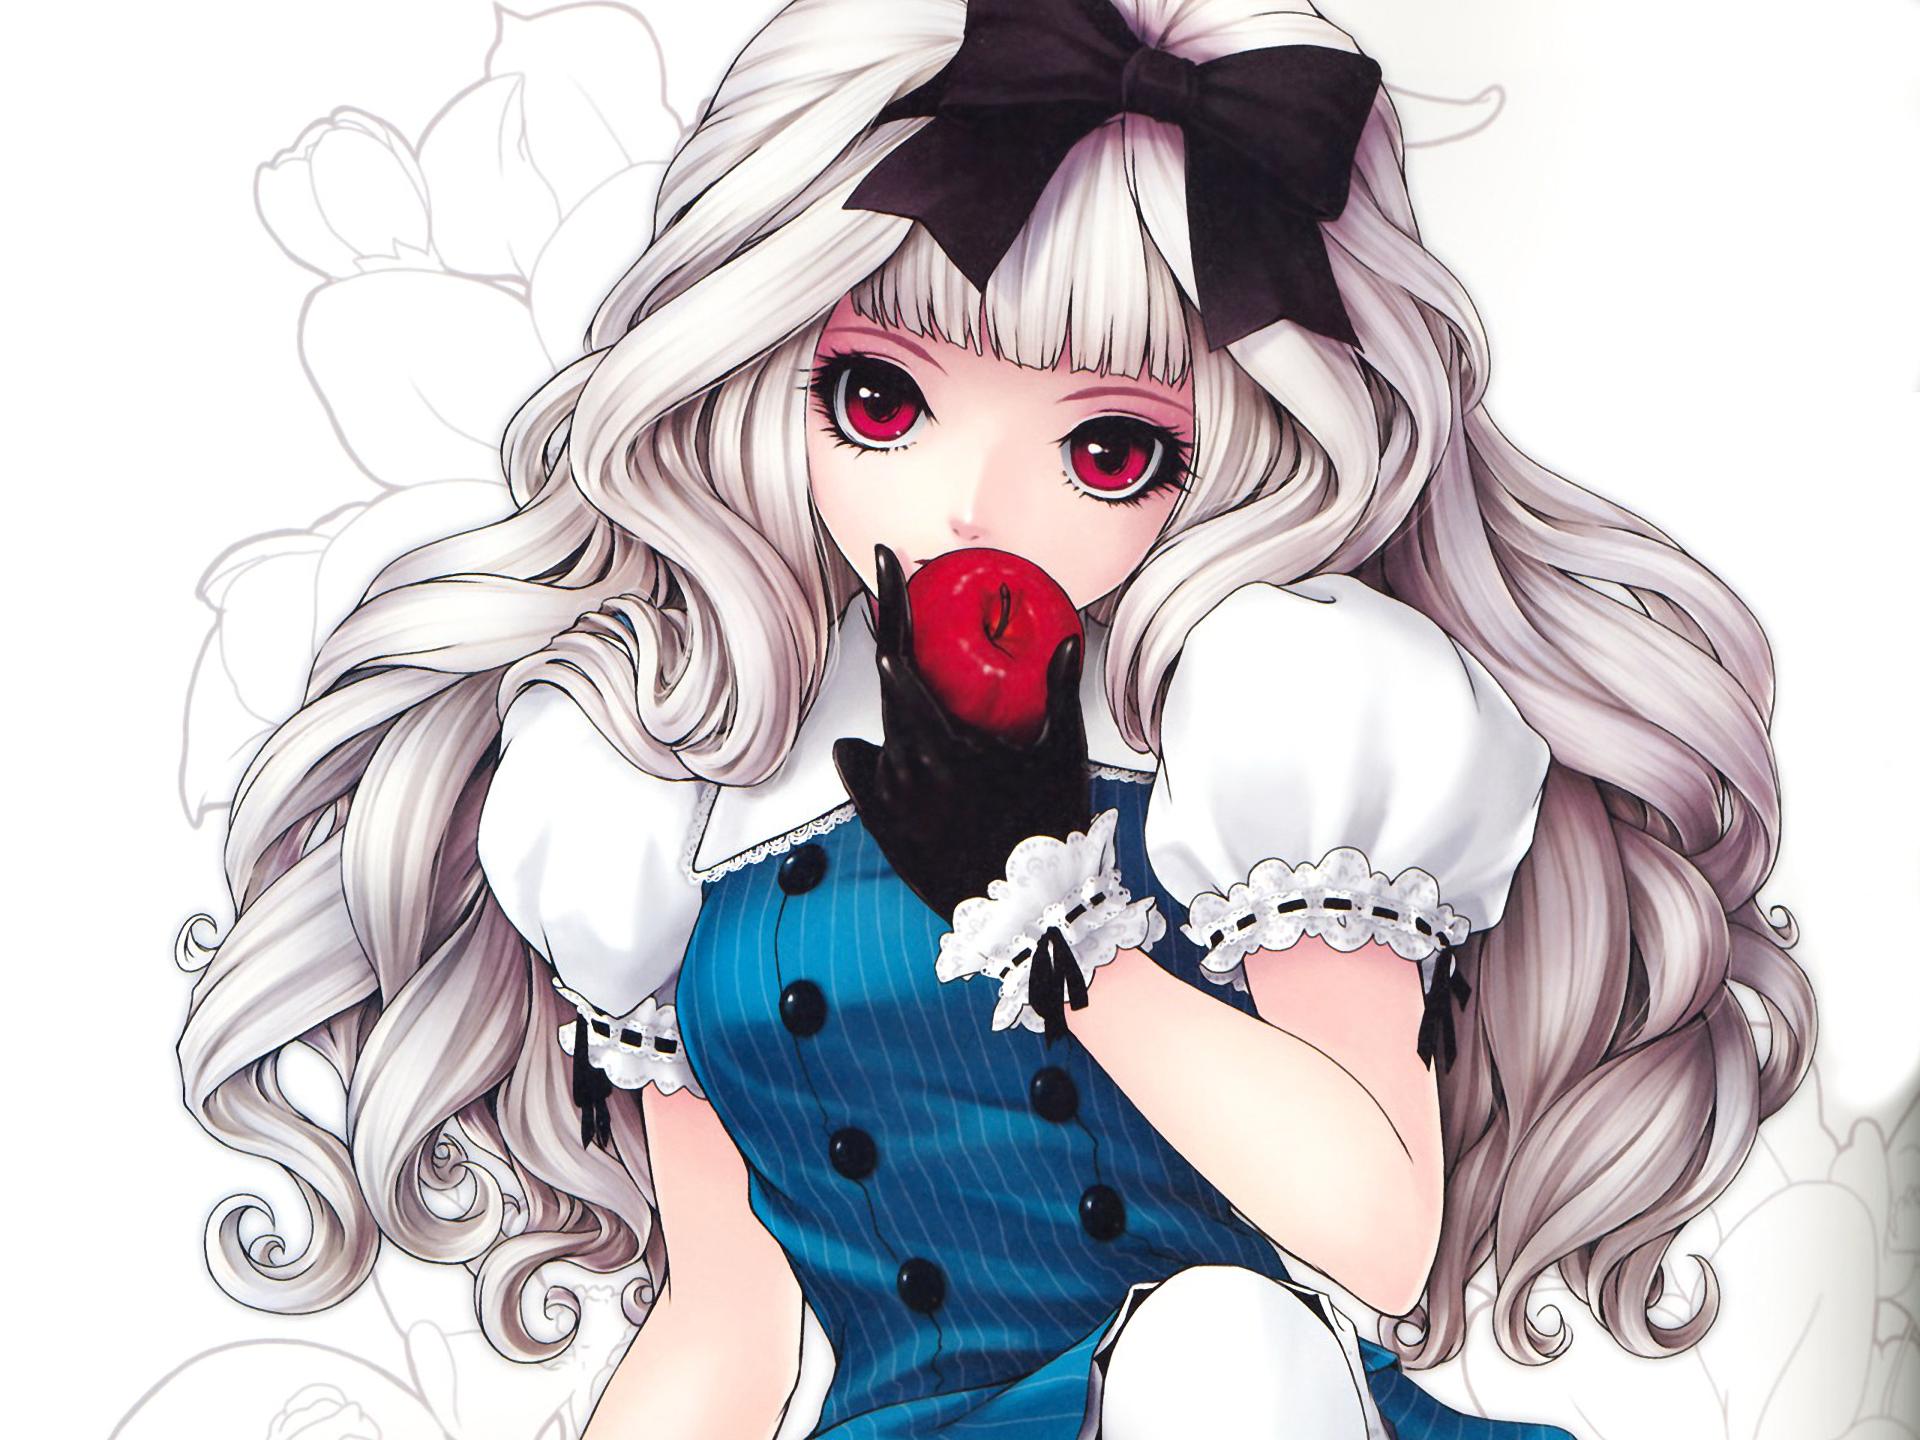 hinh nen anime girl dang yeu 6